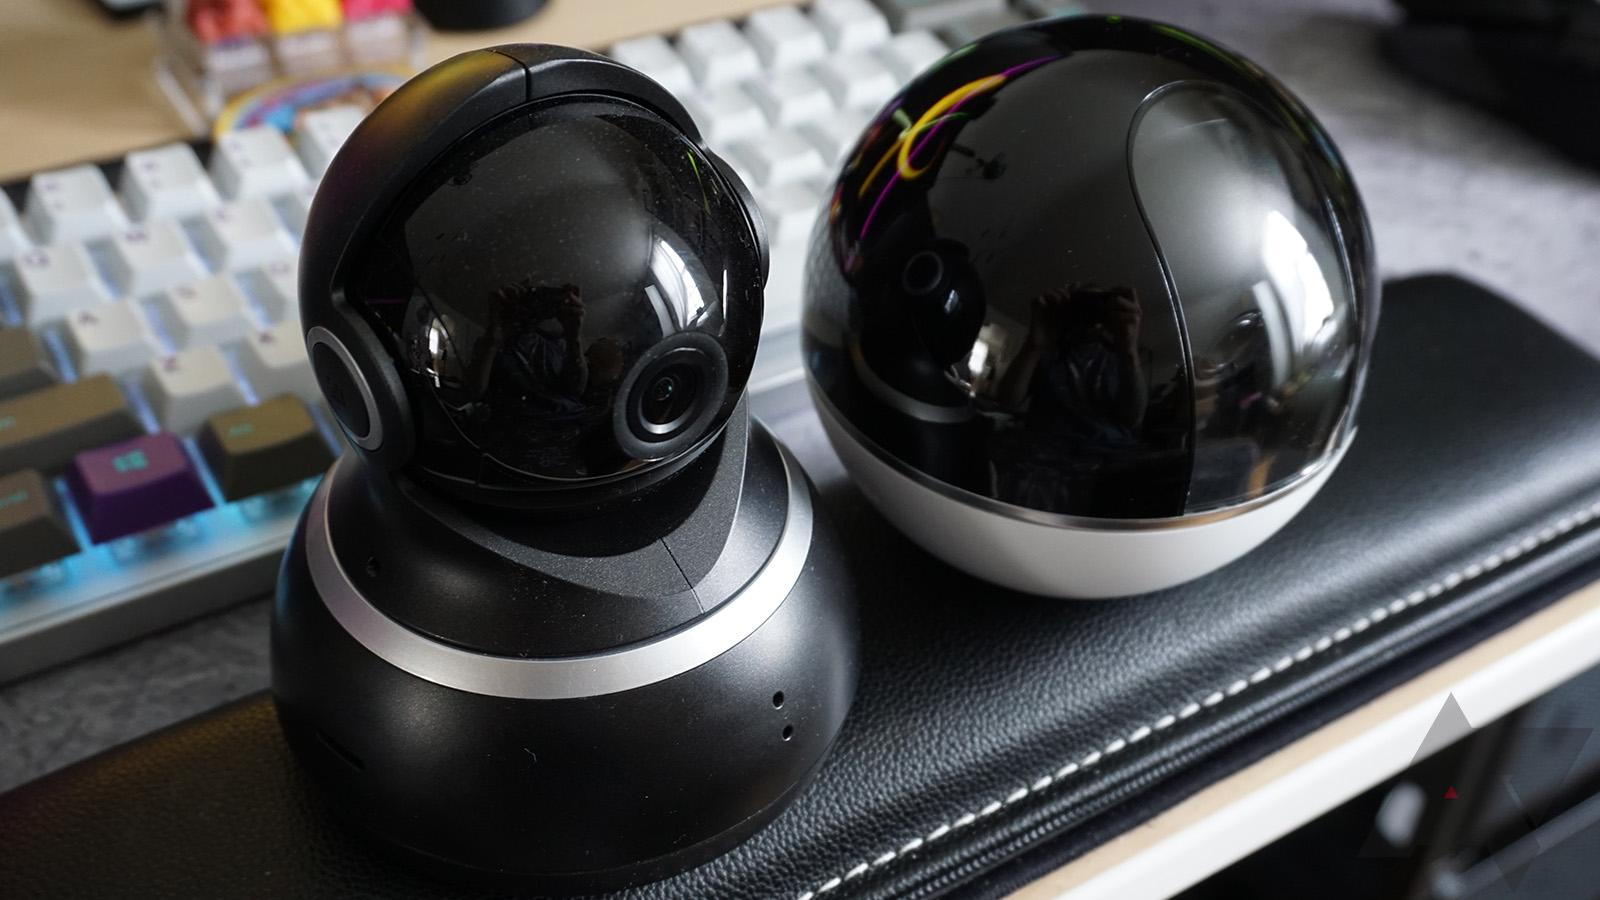 EZVIZ Mini 360 Plus review: An adorable 360-degree camera